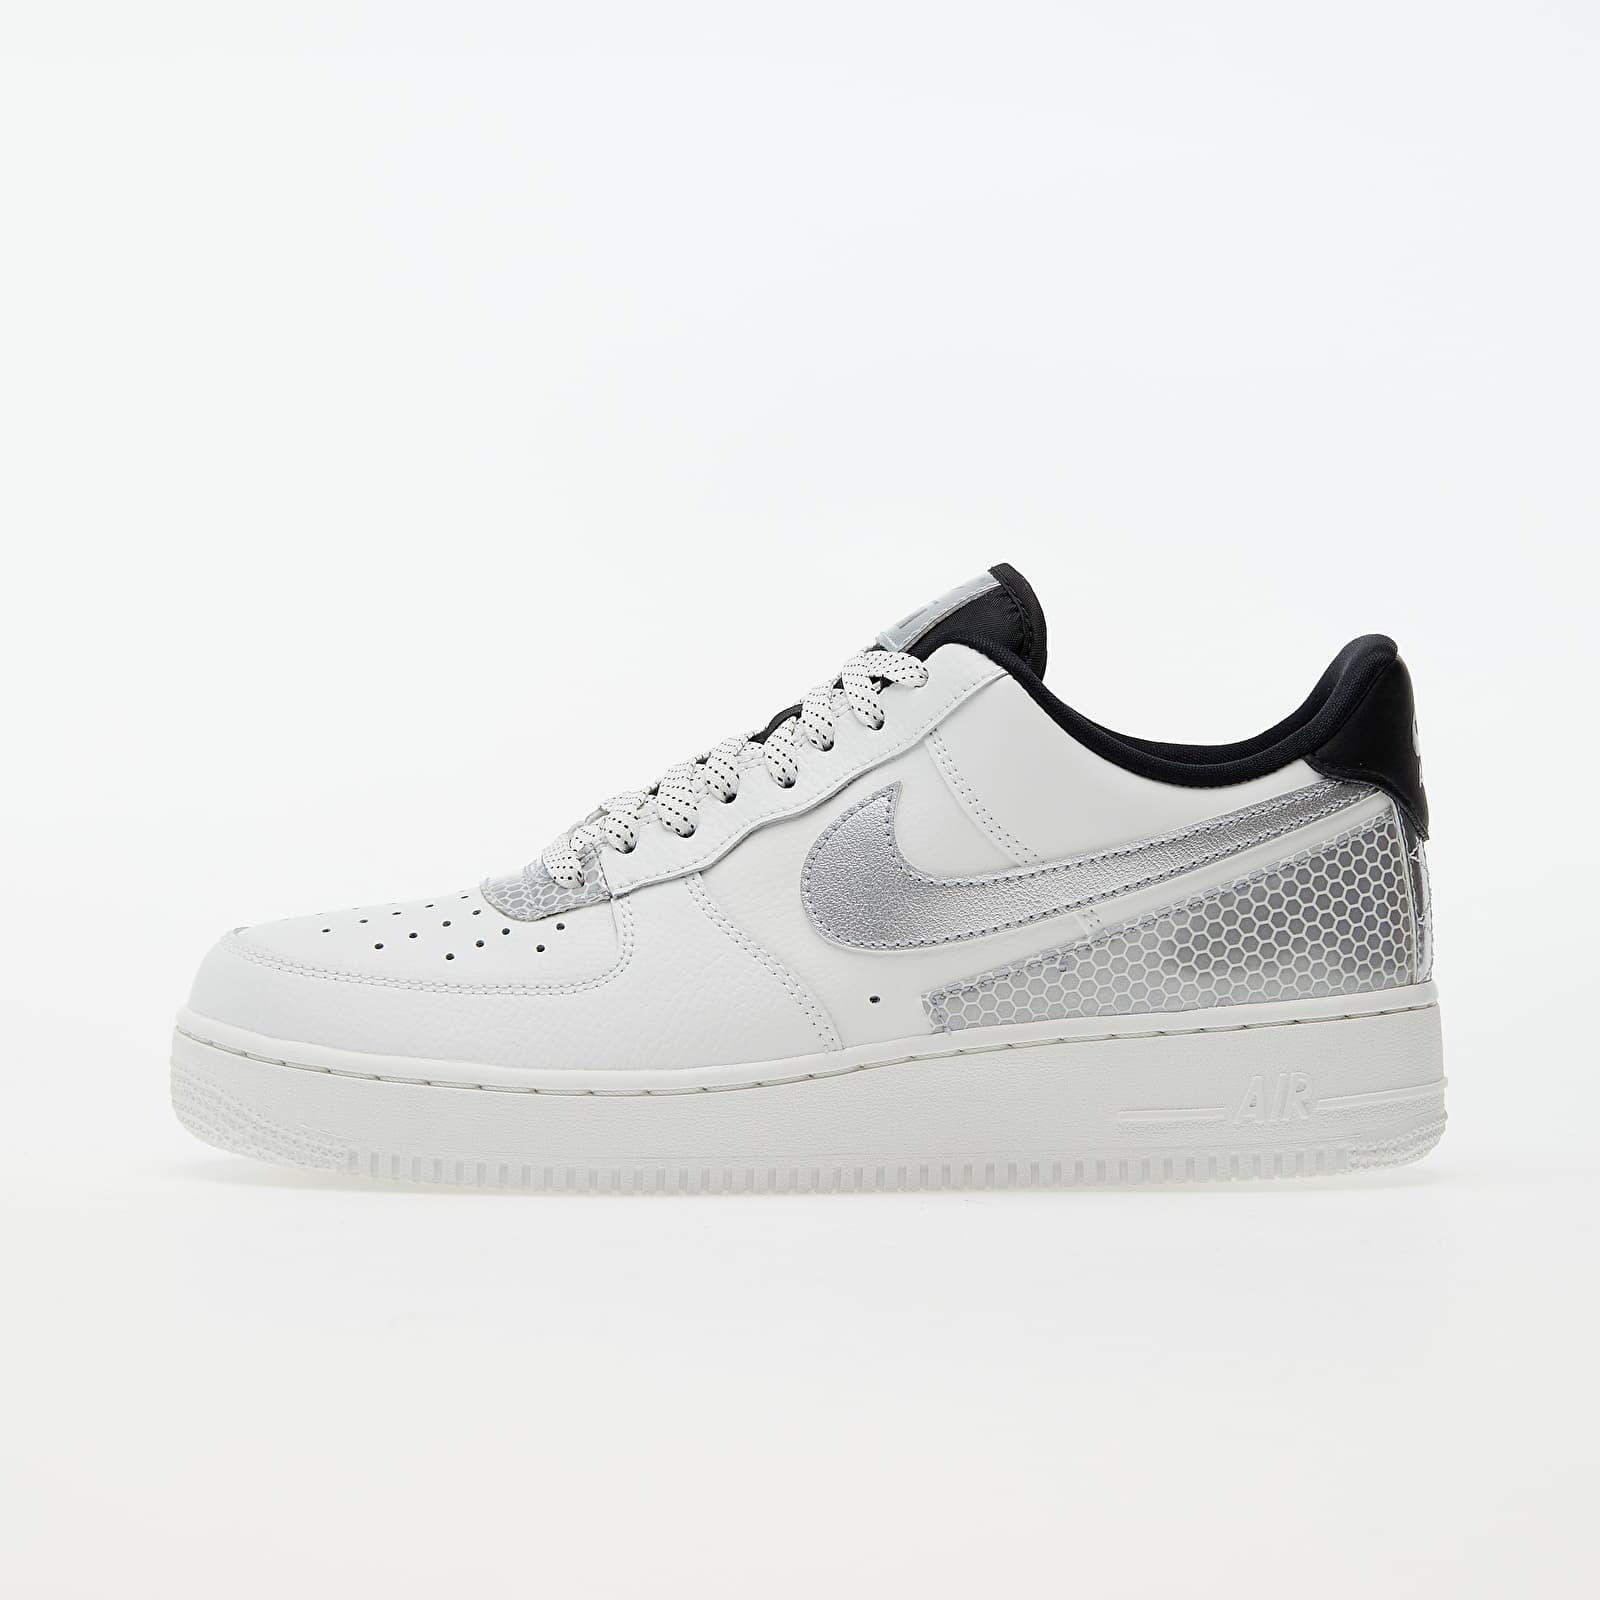 Nike Air Force 1 '07 LV8 3M Summit White/ Summit White-Black EUR 46